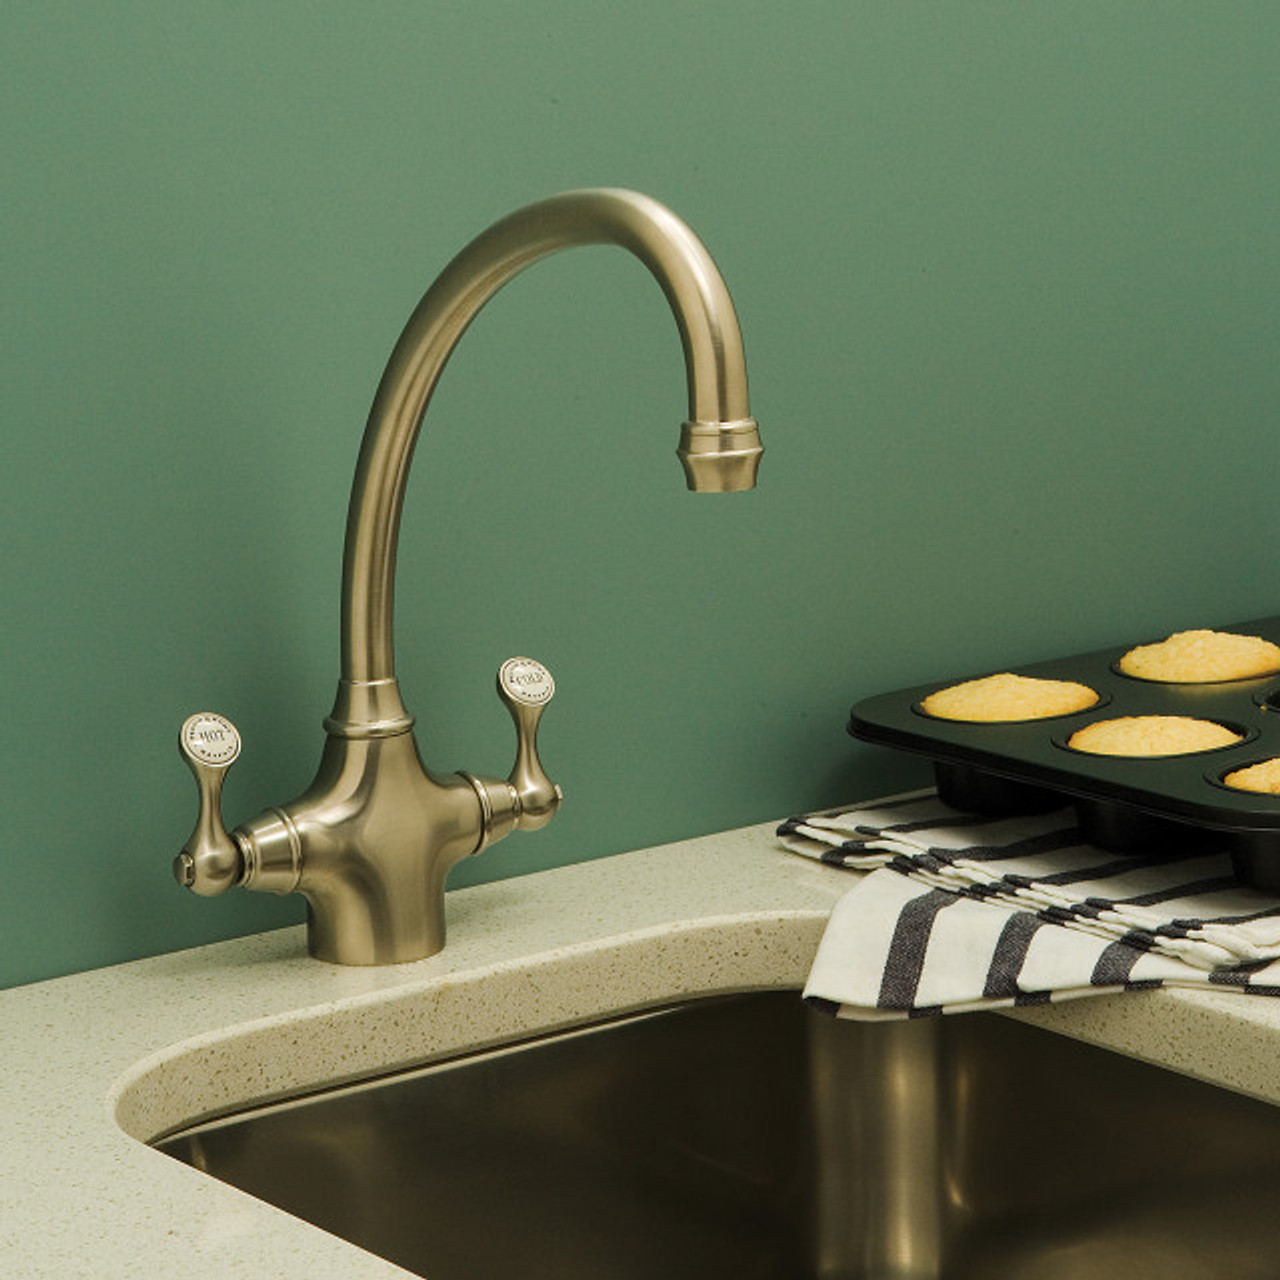 Perrin & Rowe Etruscan 4320 Kitchen Tap - Sinks